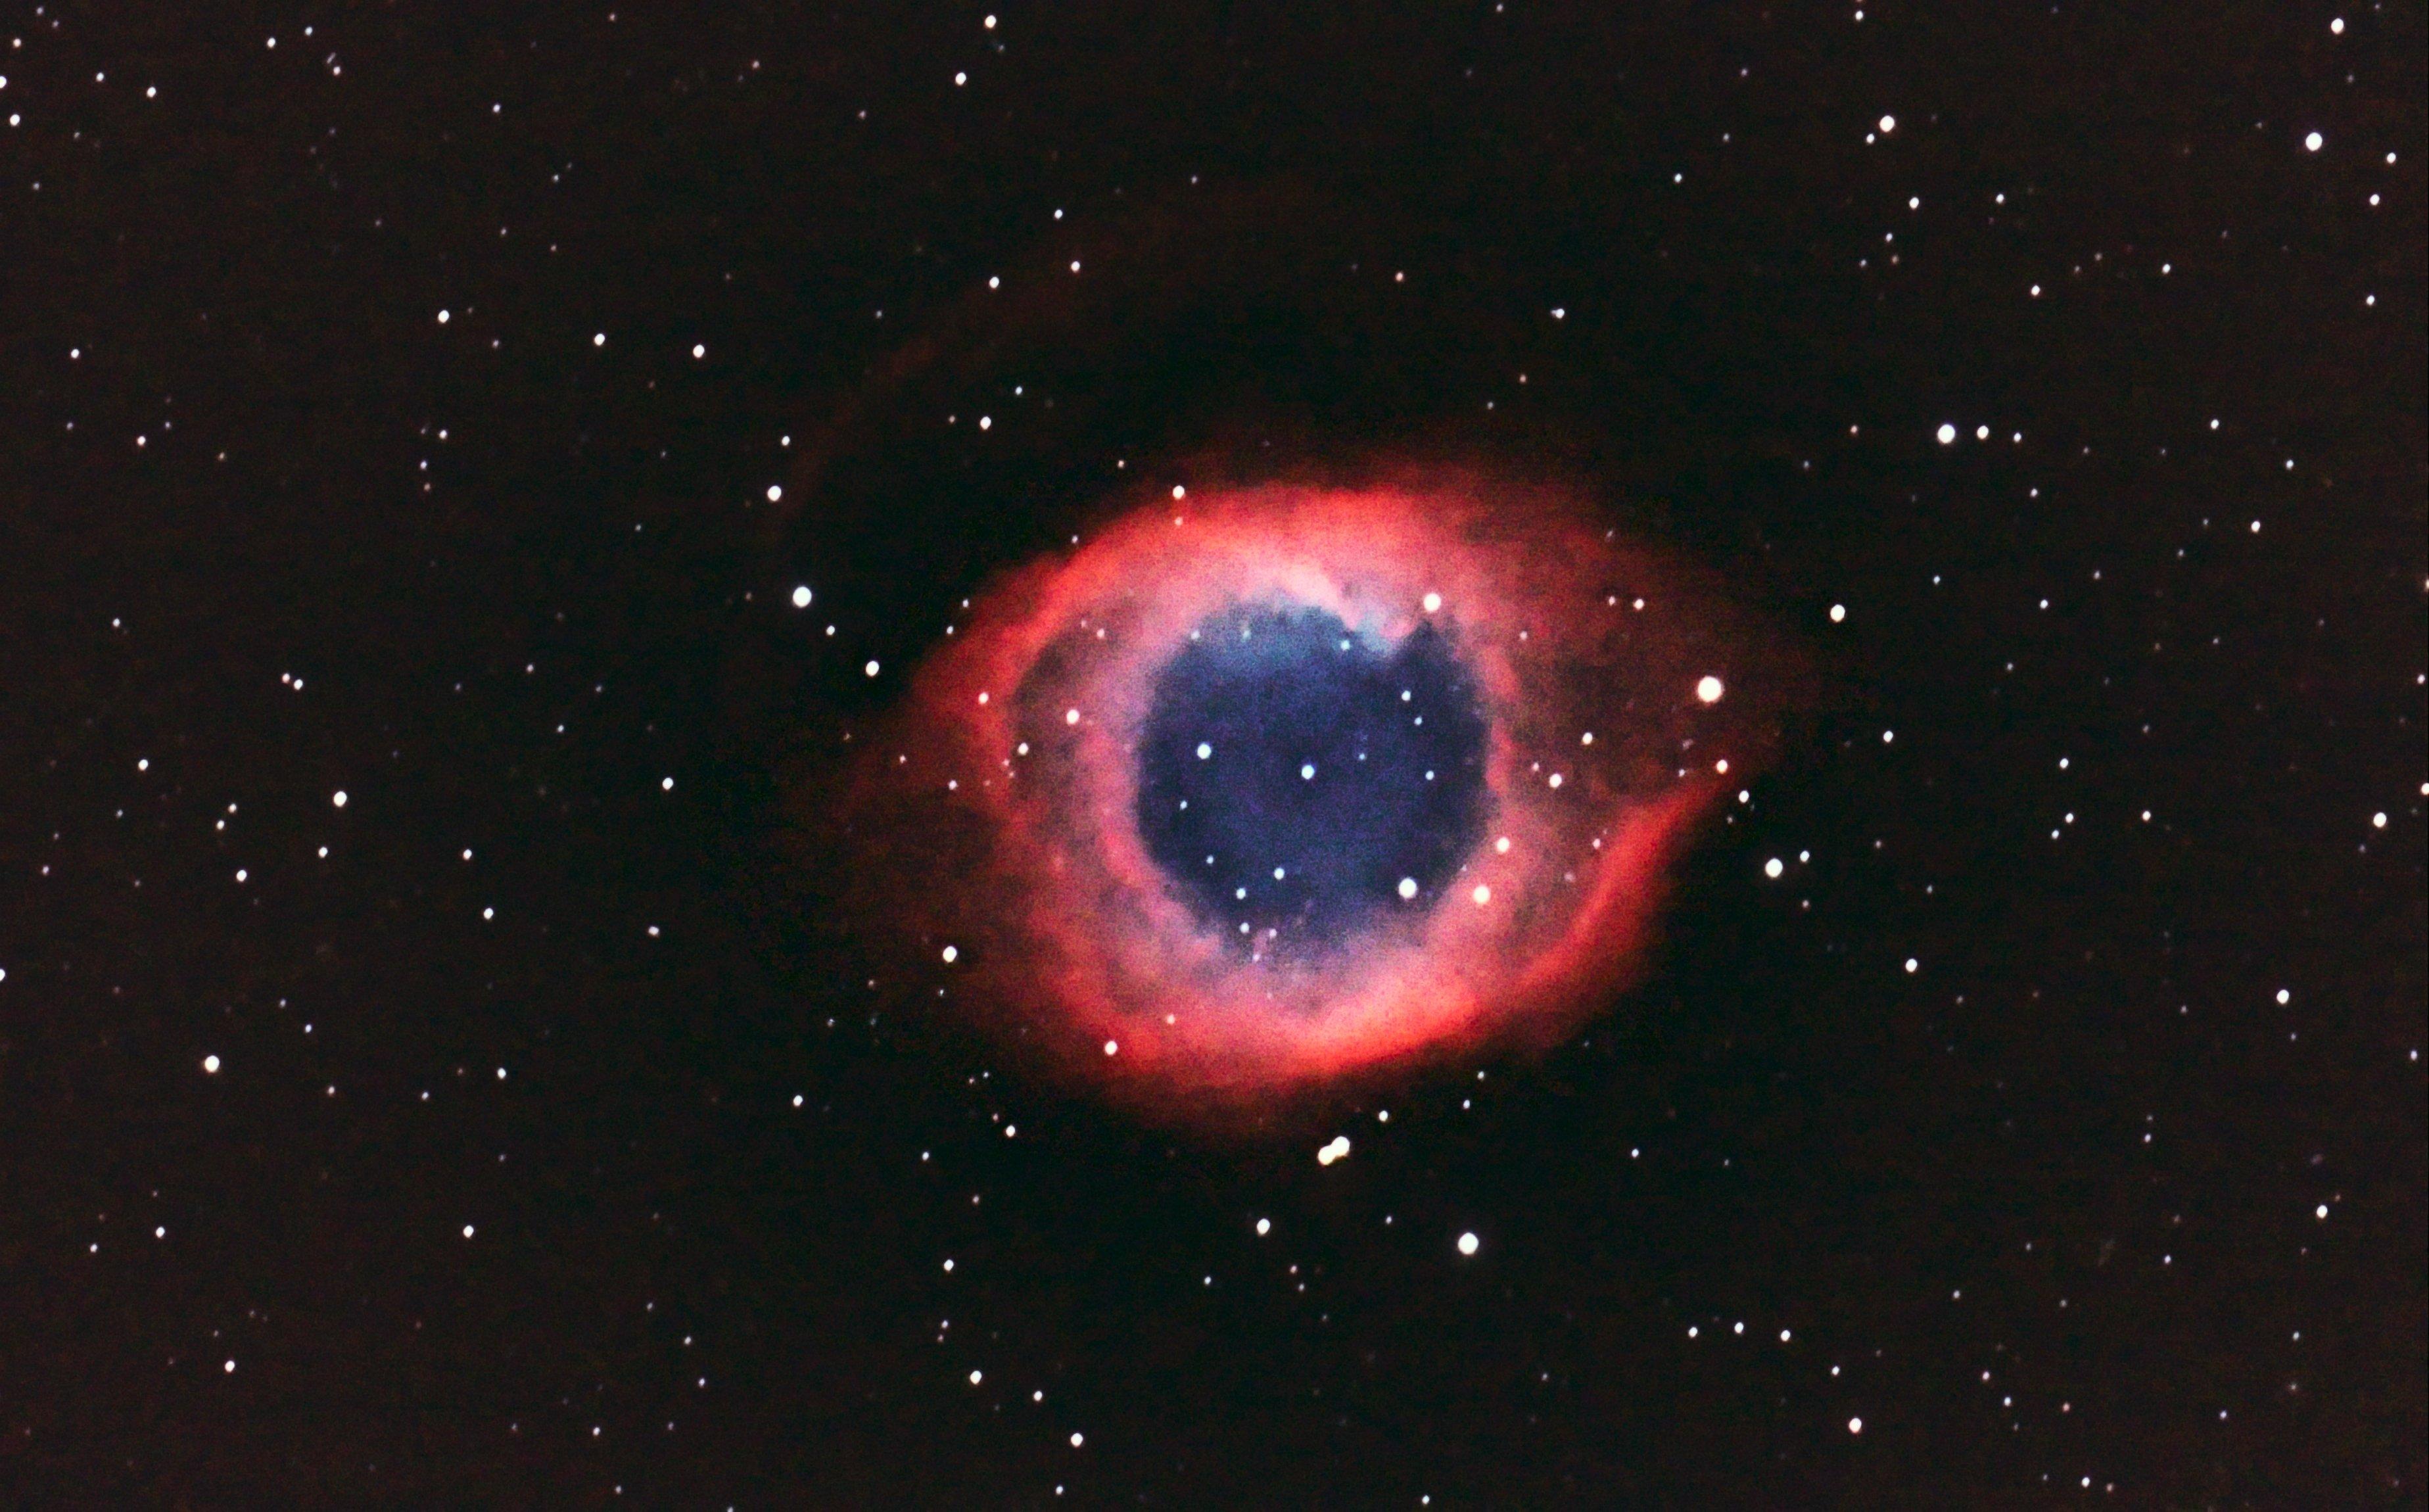 Eye of God Nebula Wallpaper - WallpaperSafari